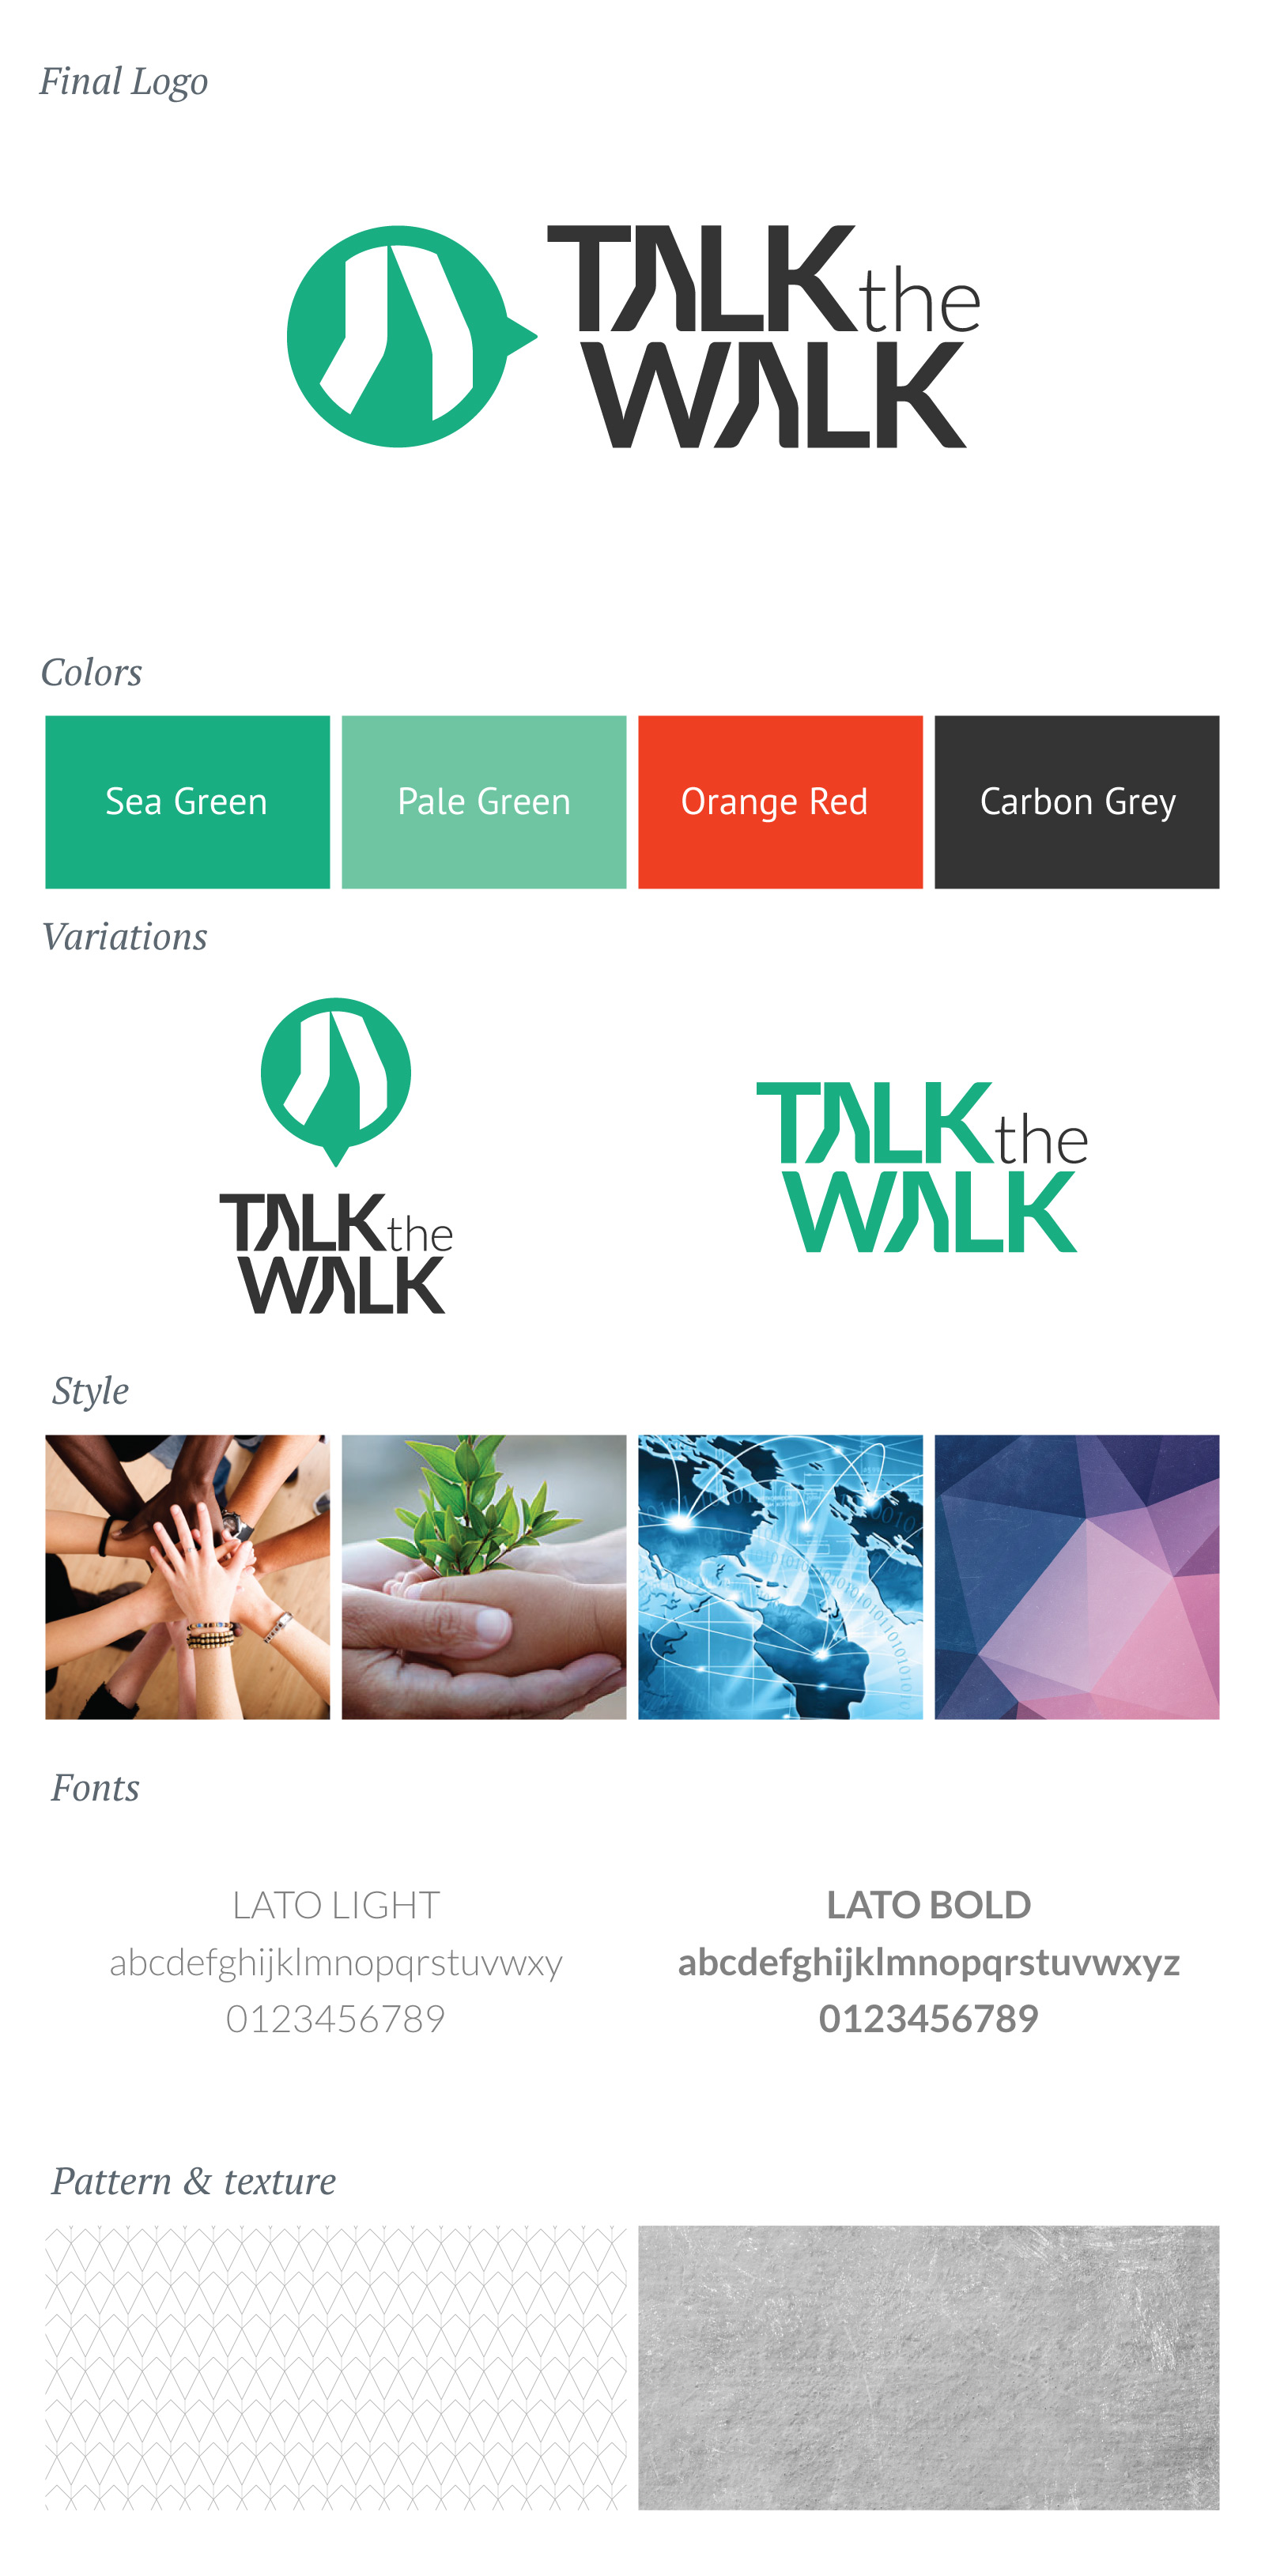 Talk-The-Walk-Identity-Board-Logo@2x